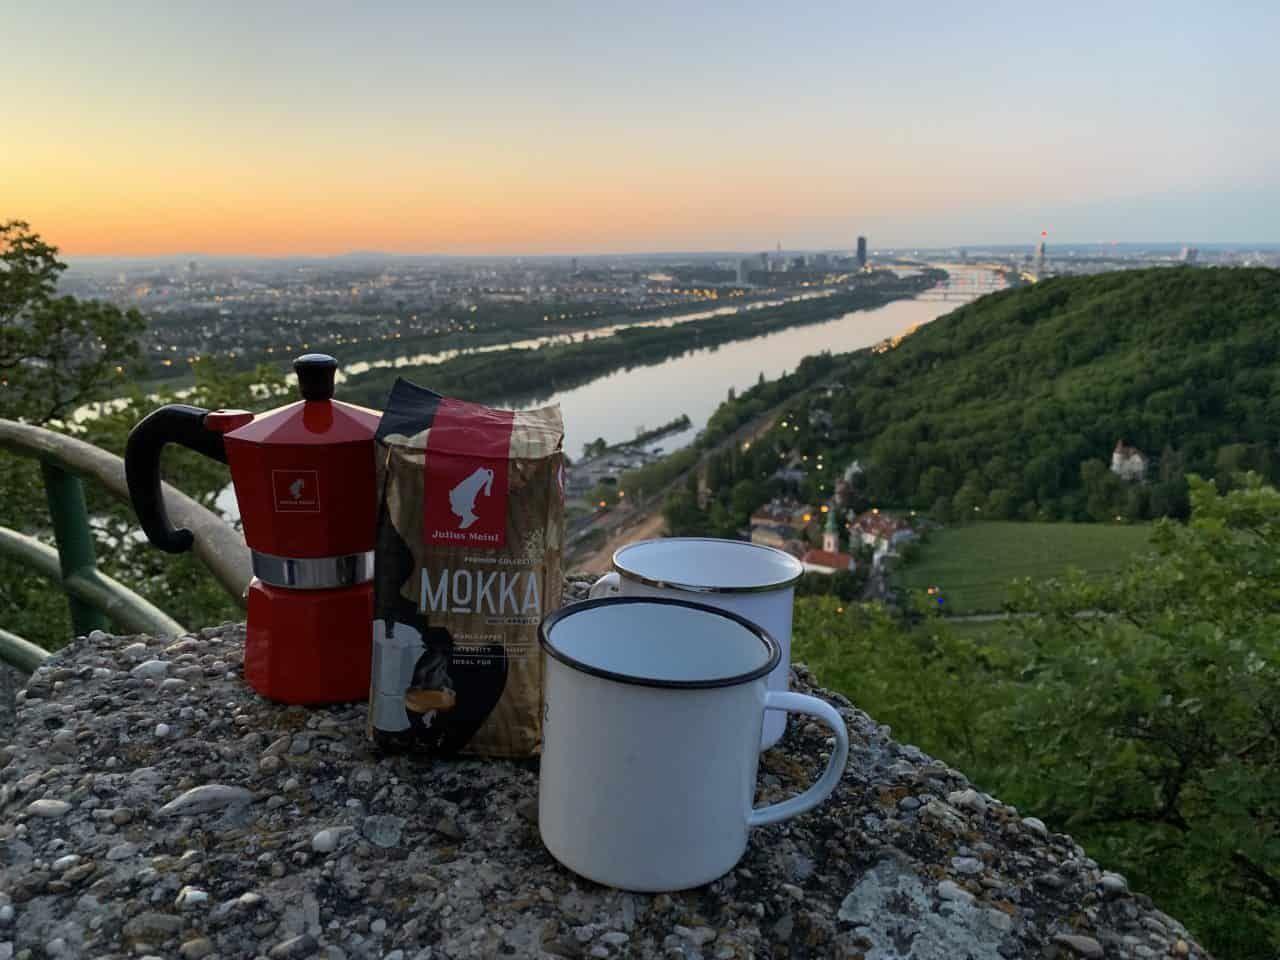 Kaffeegenuss über der Stadt, Sponsored (c) Lisa Oberndorfer | 1000things